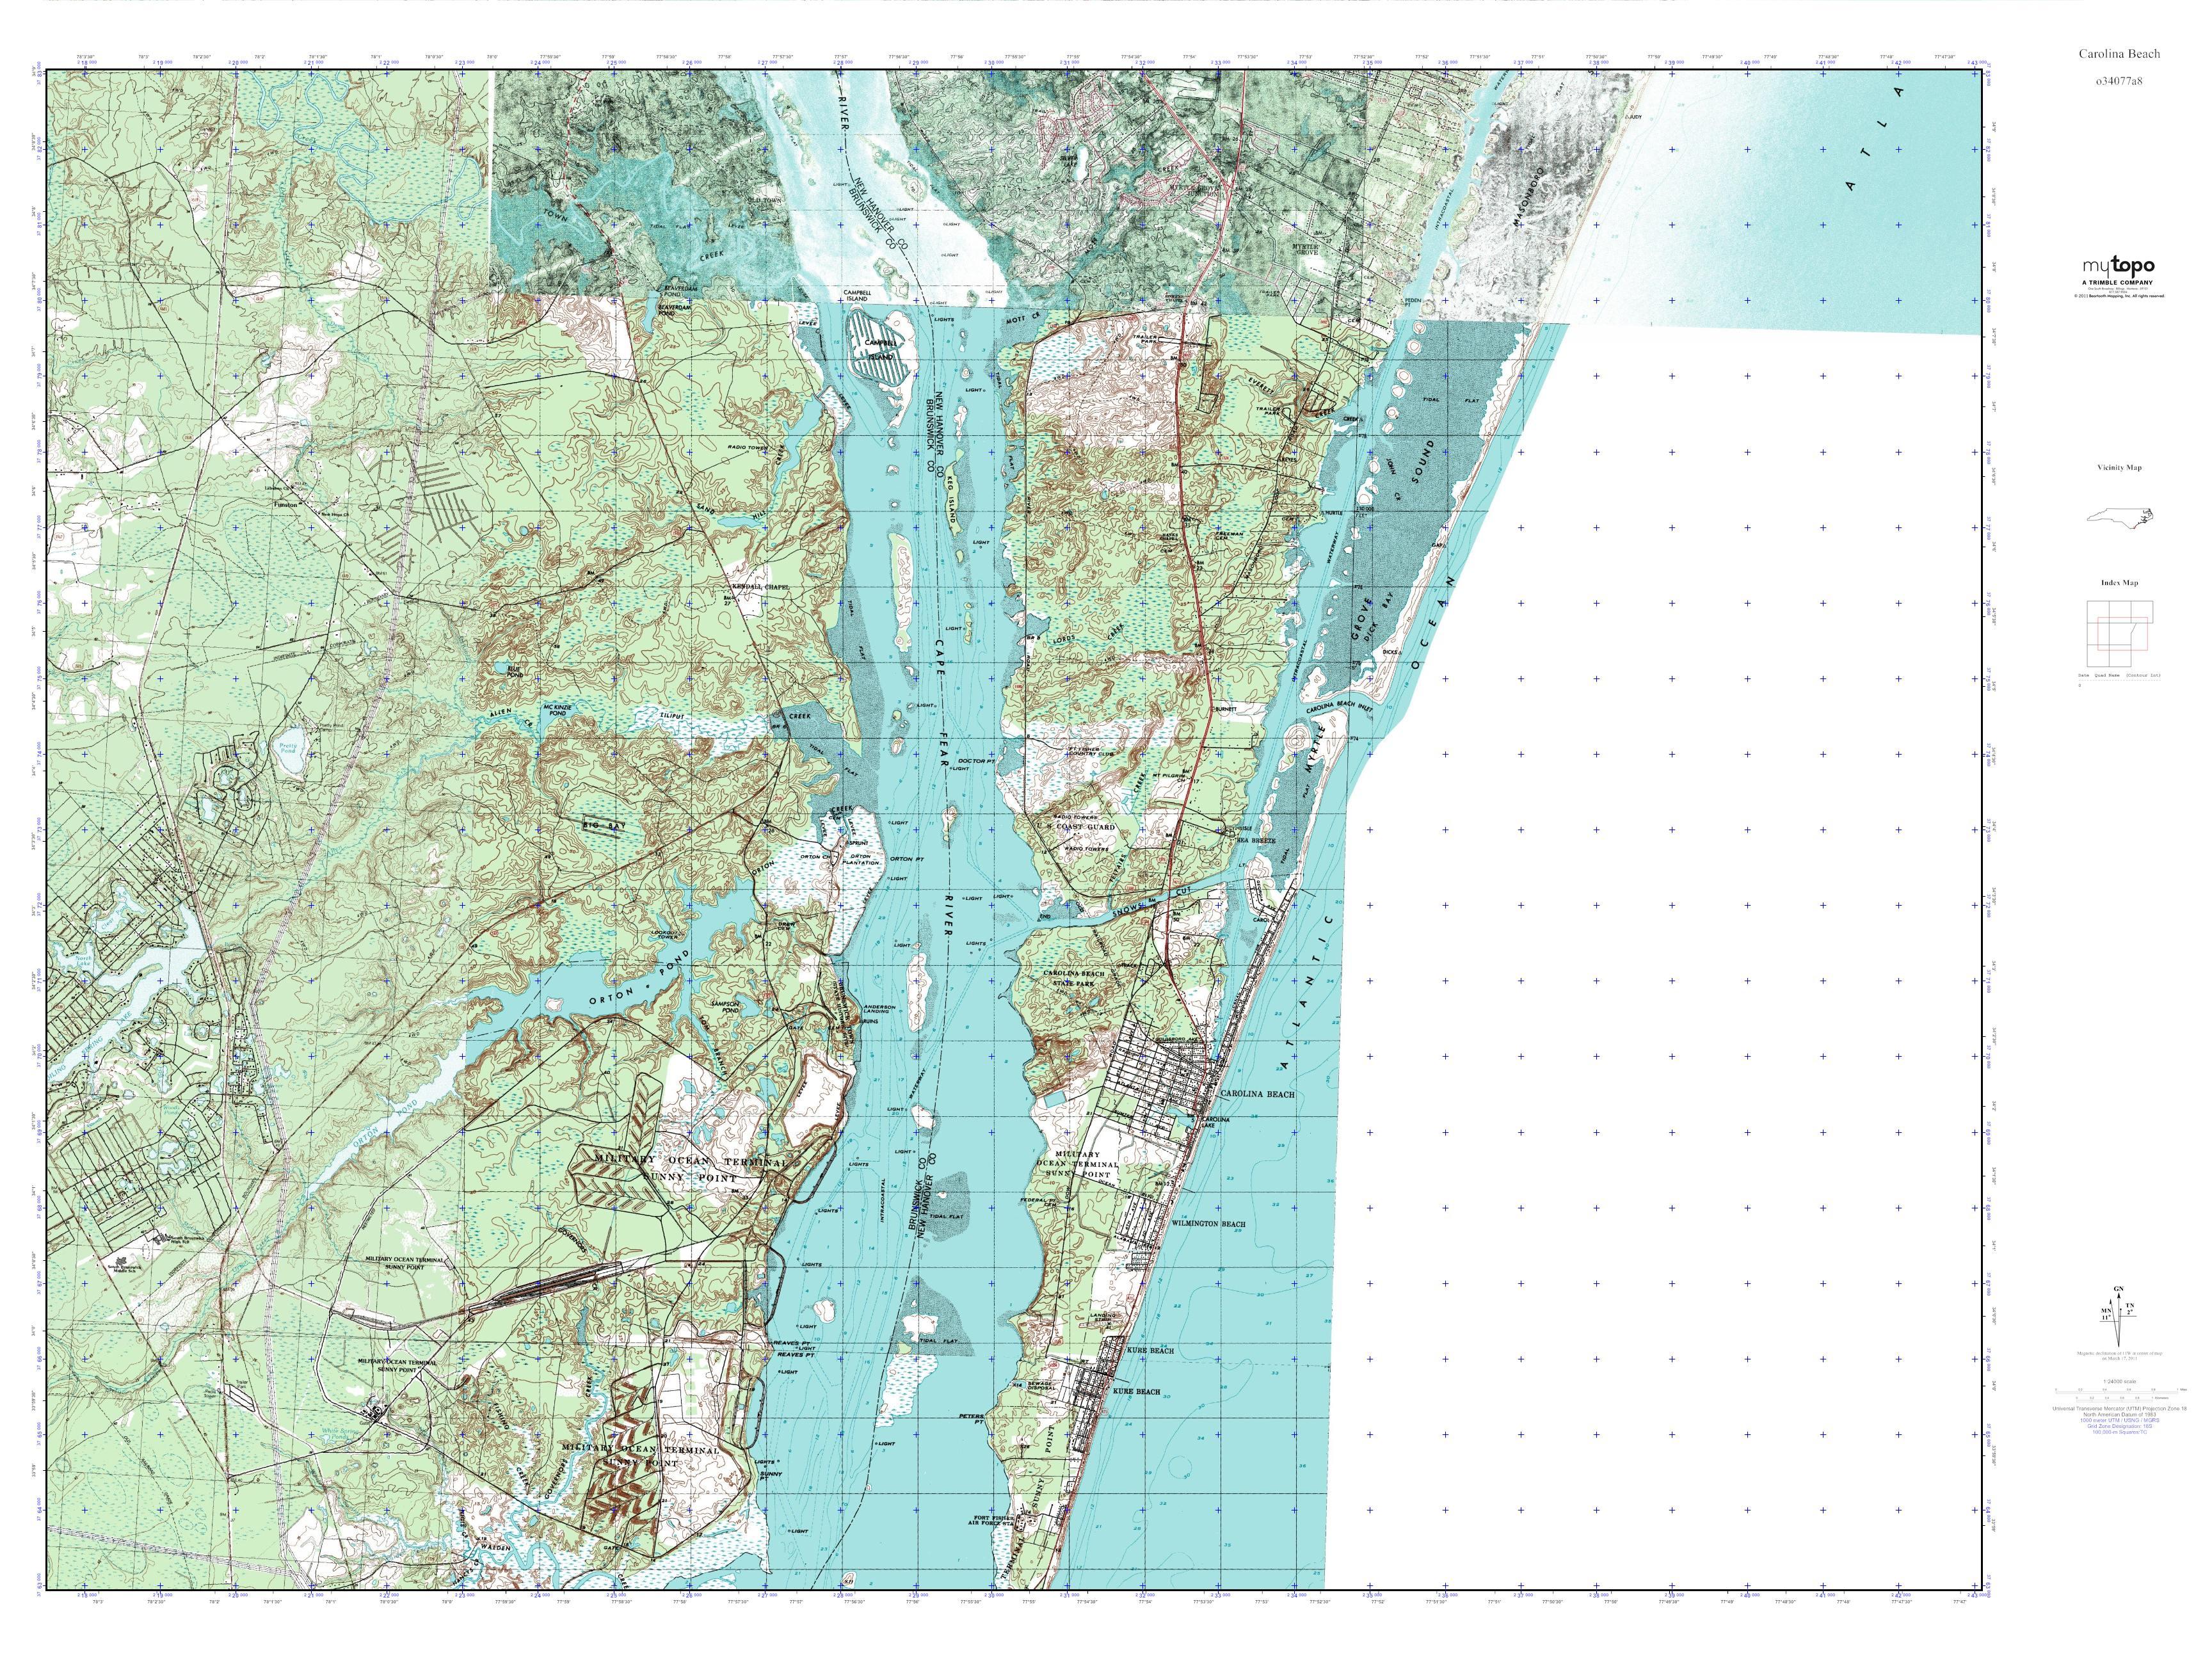 MyTopo Carolina Beach, North Carolina USGS Quad Topo Map on